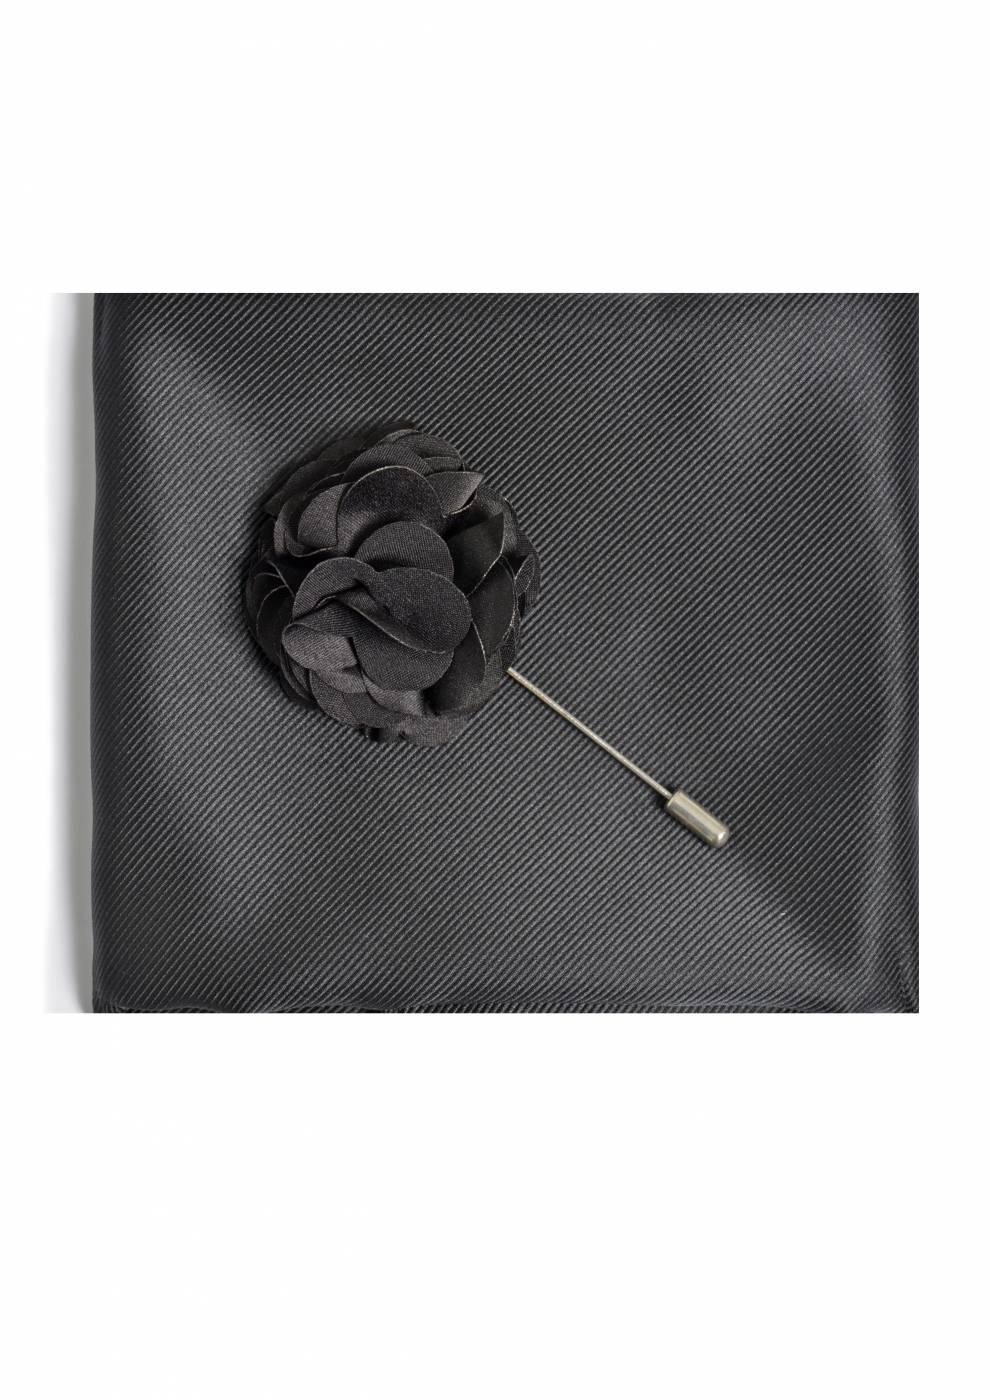 50.JamesPinSquare-Black